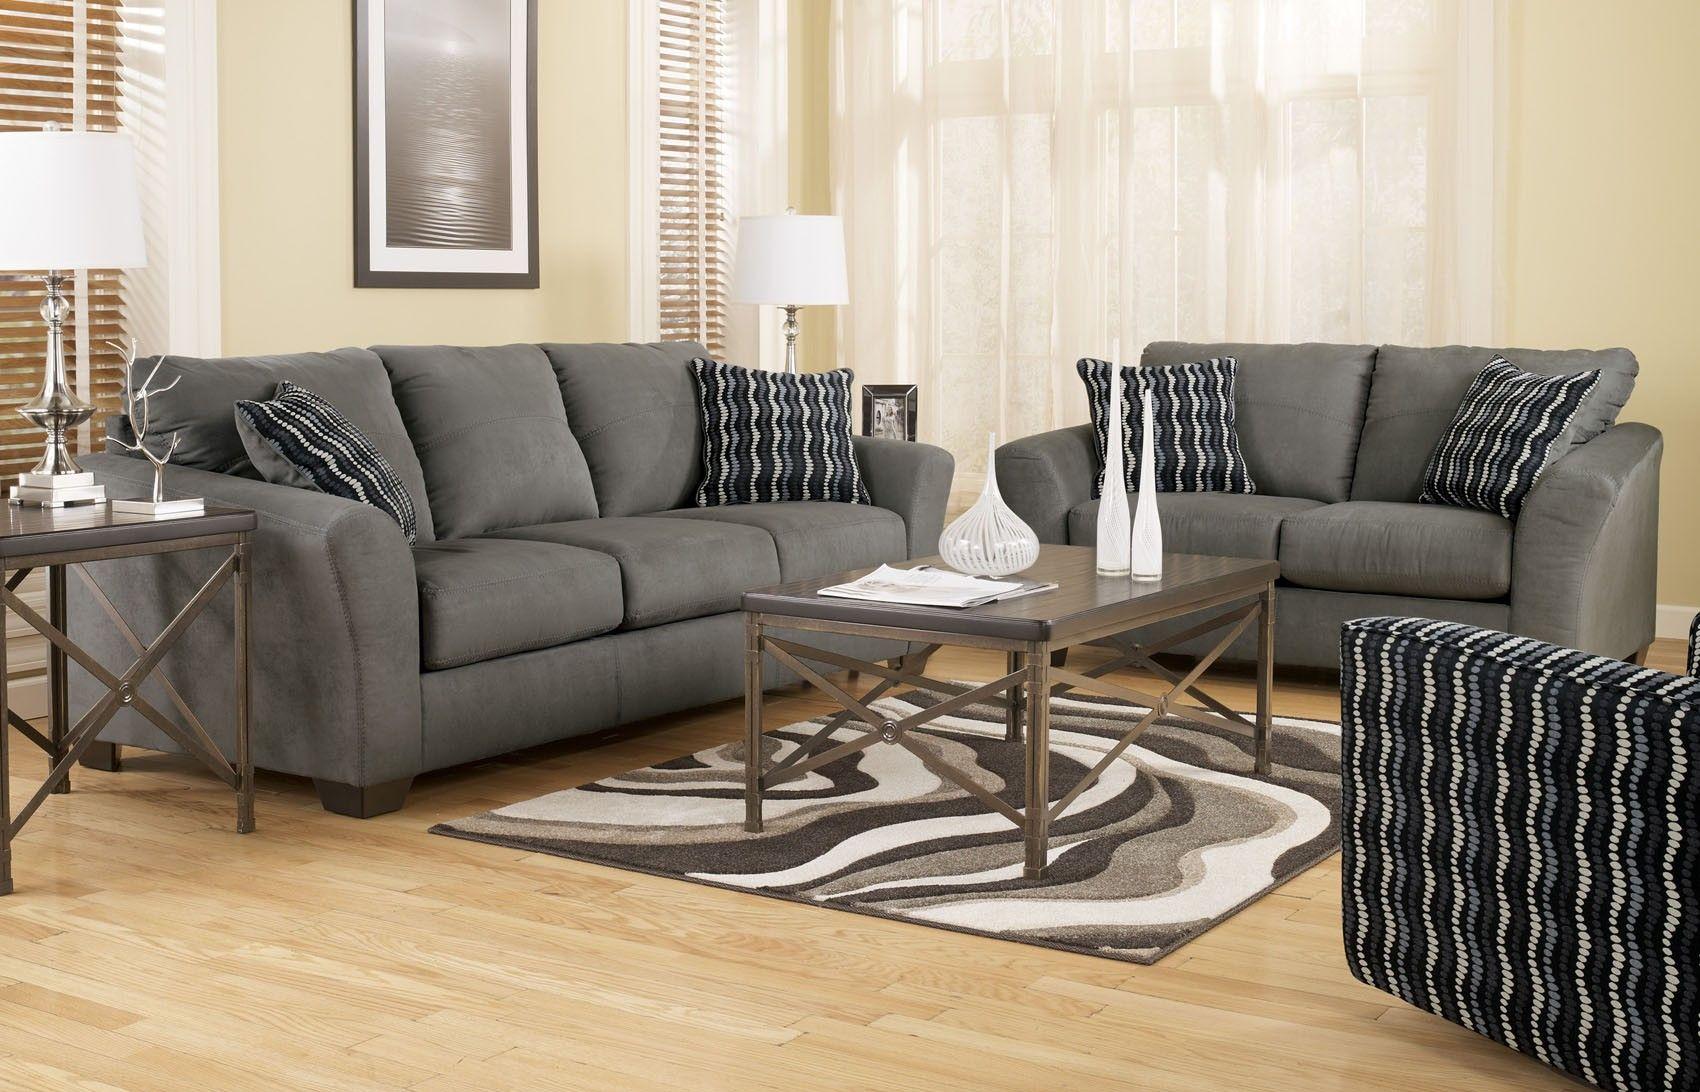 Lexi Cobblestone Sofa And Loveseat Set 7310338   Ashley Furniture 799